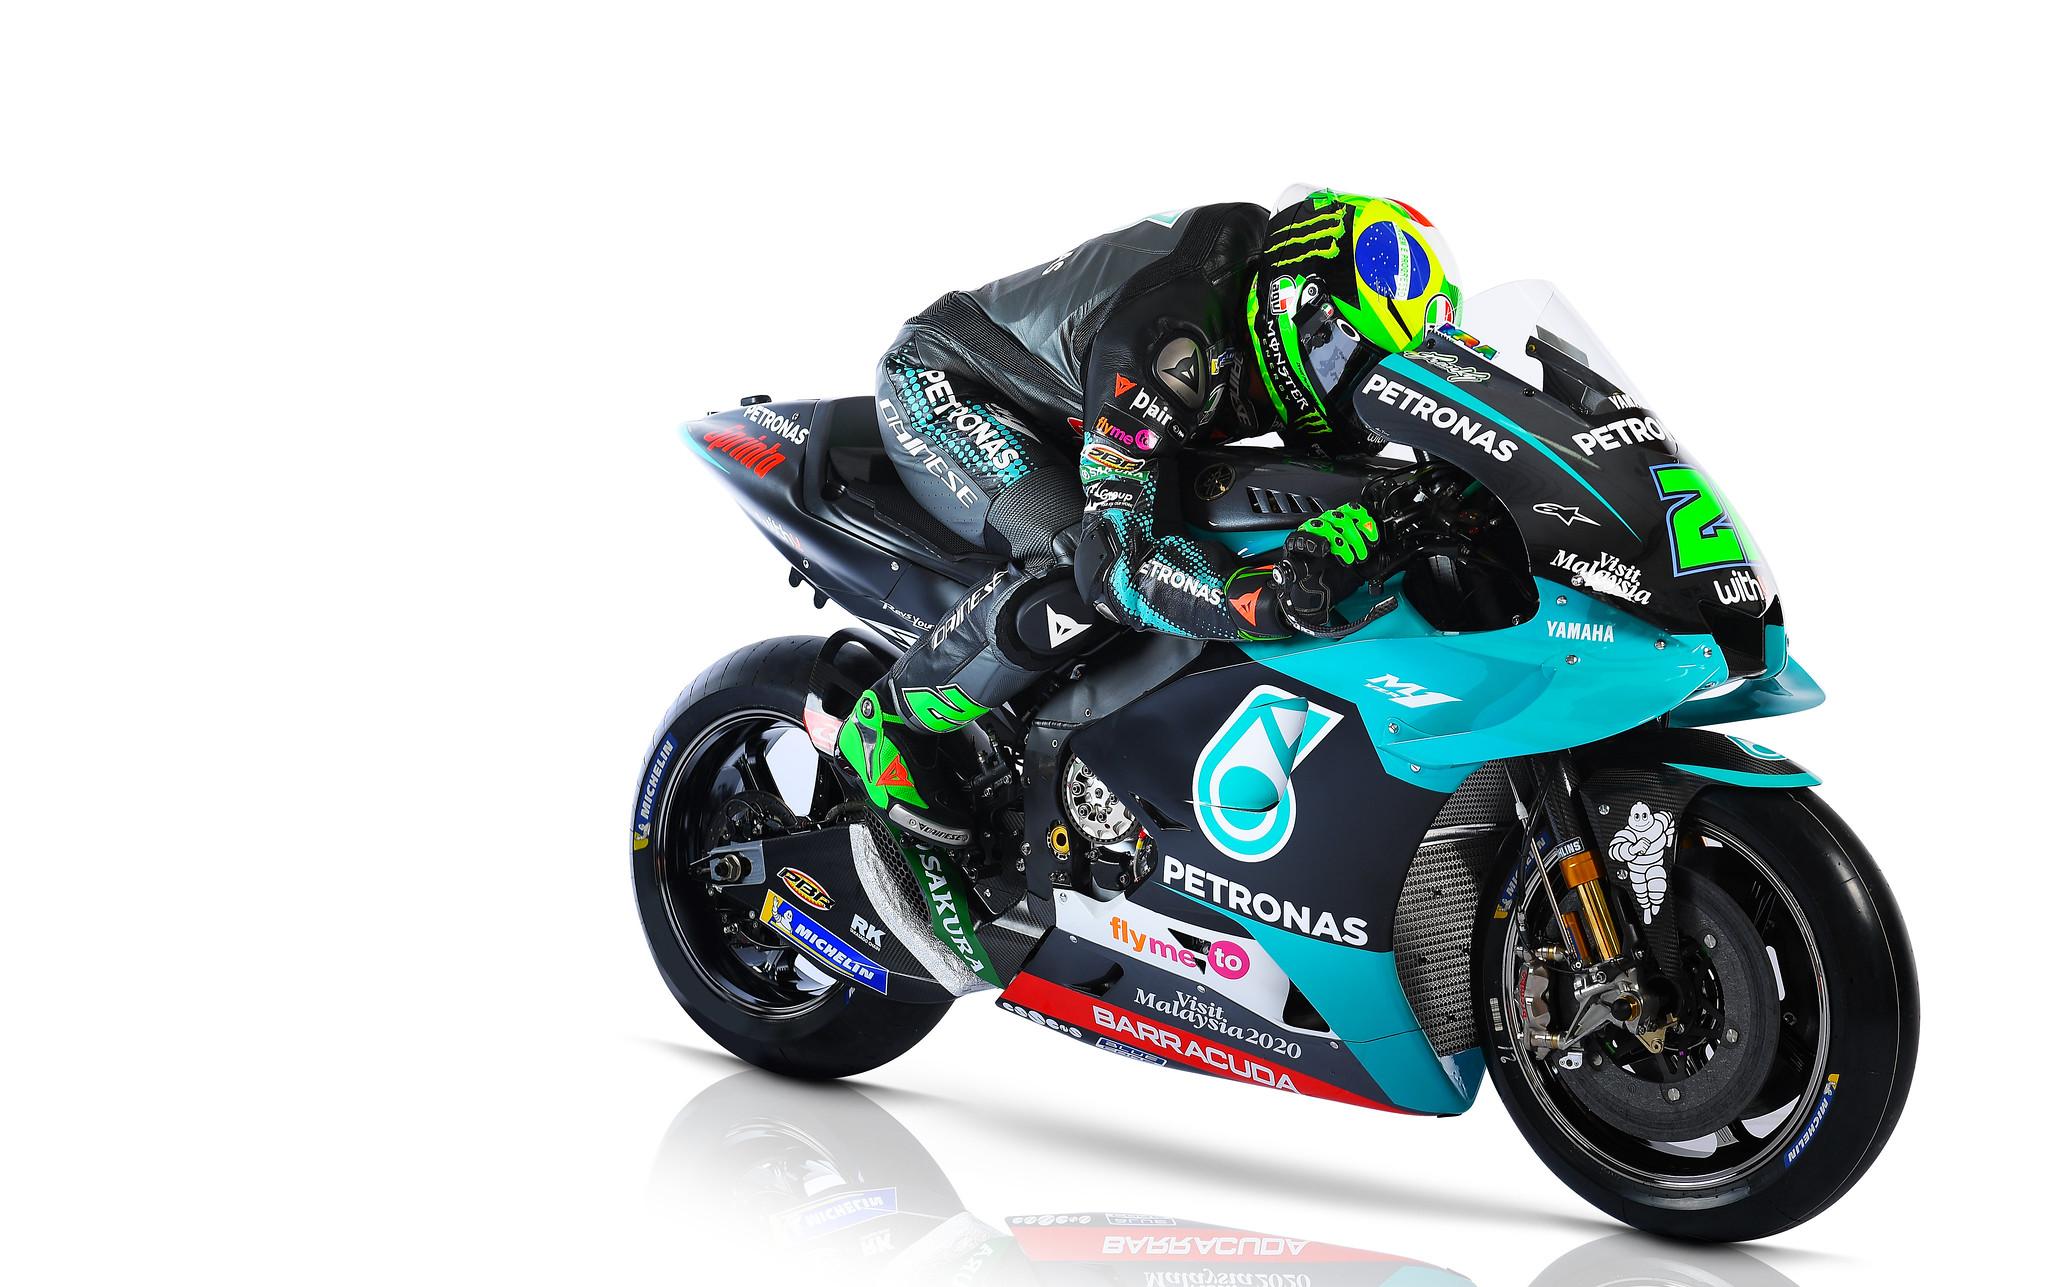 2020 Petronas Yamaha SRT